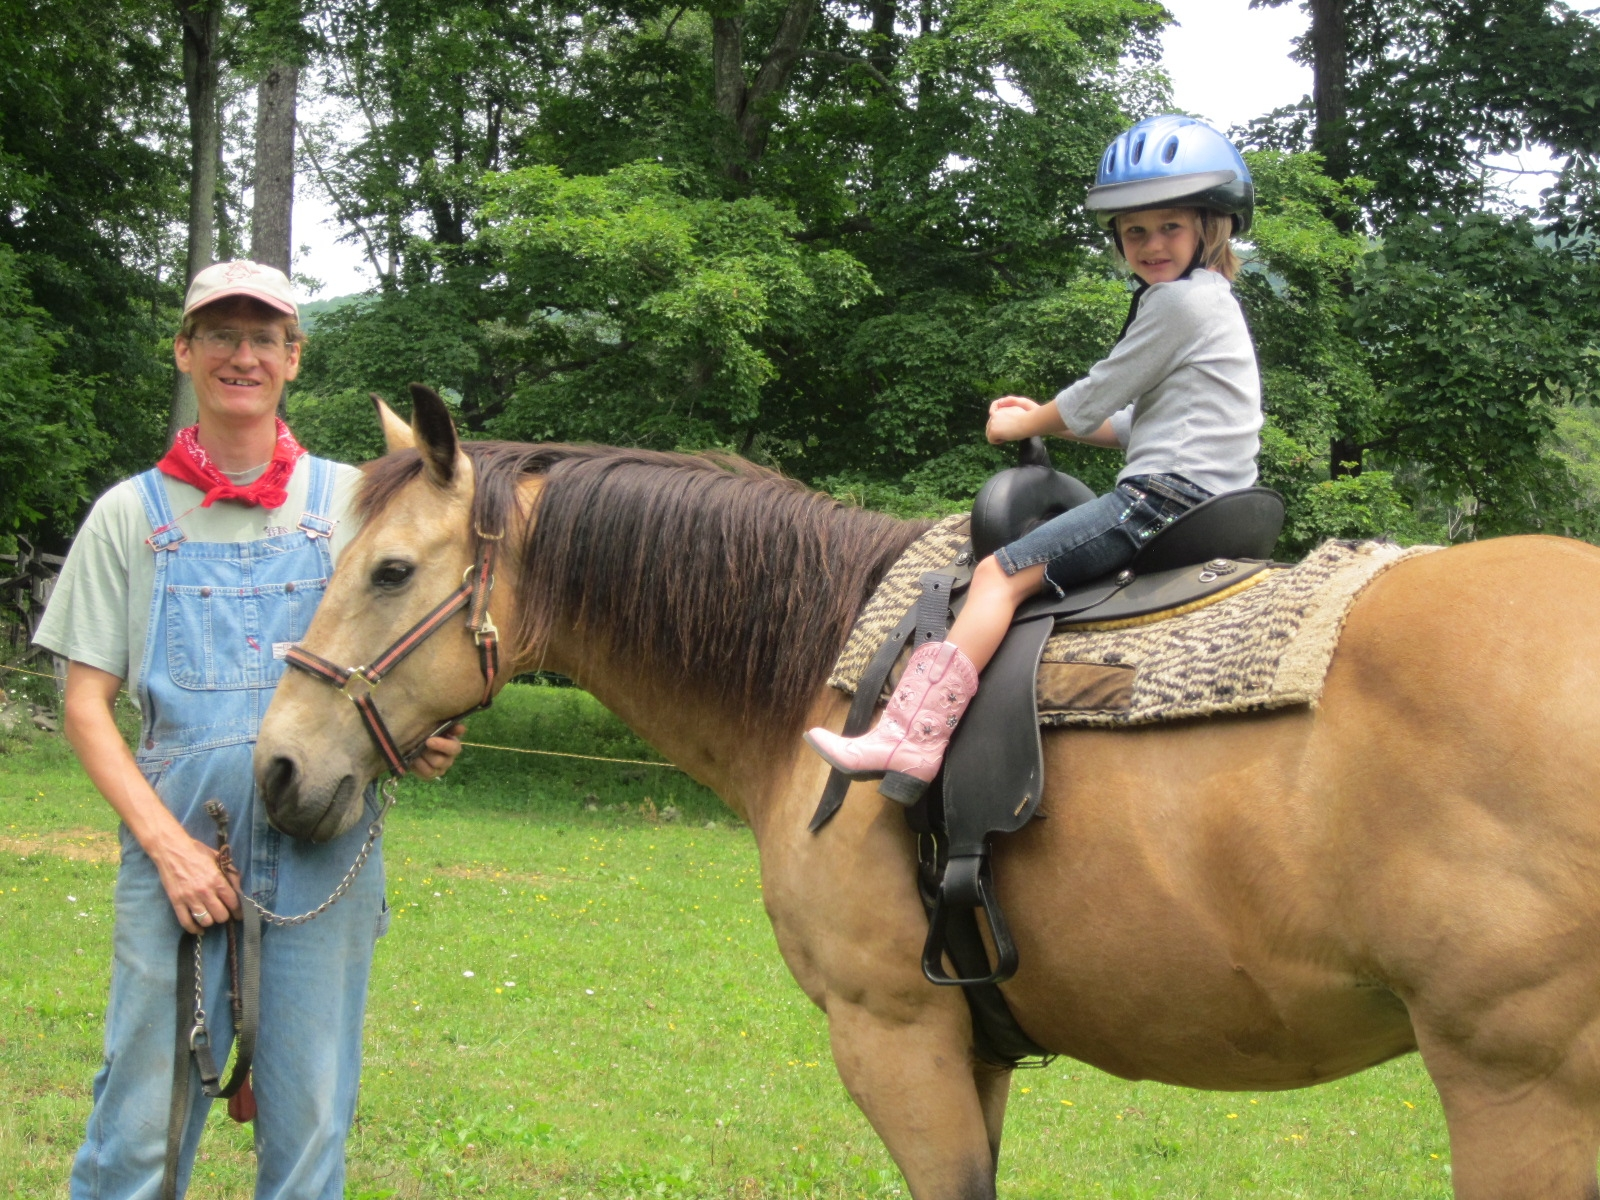 Horses_Riding 3.JPG